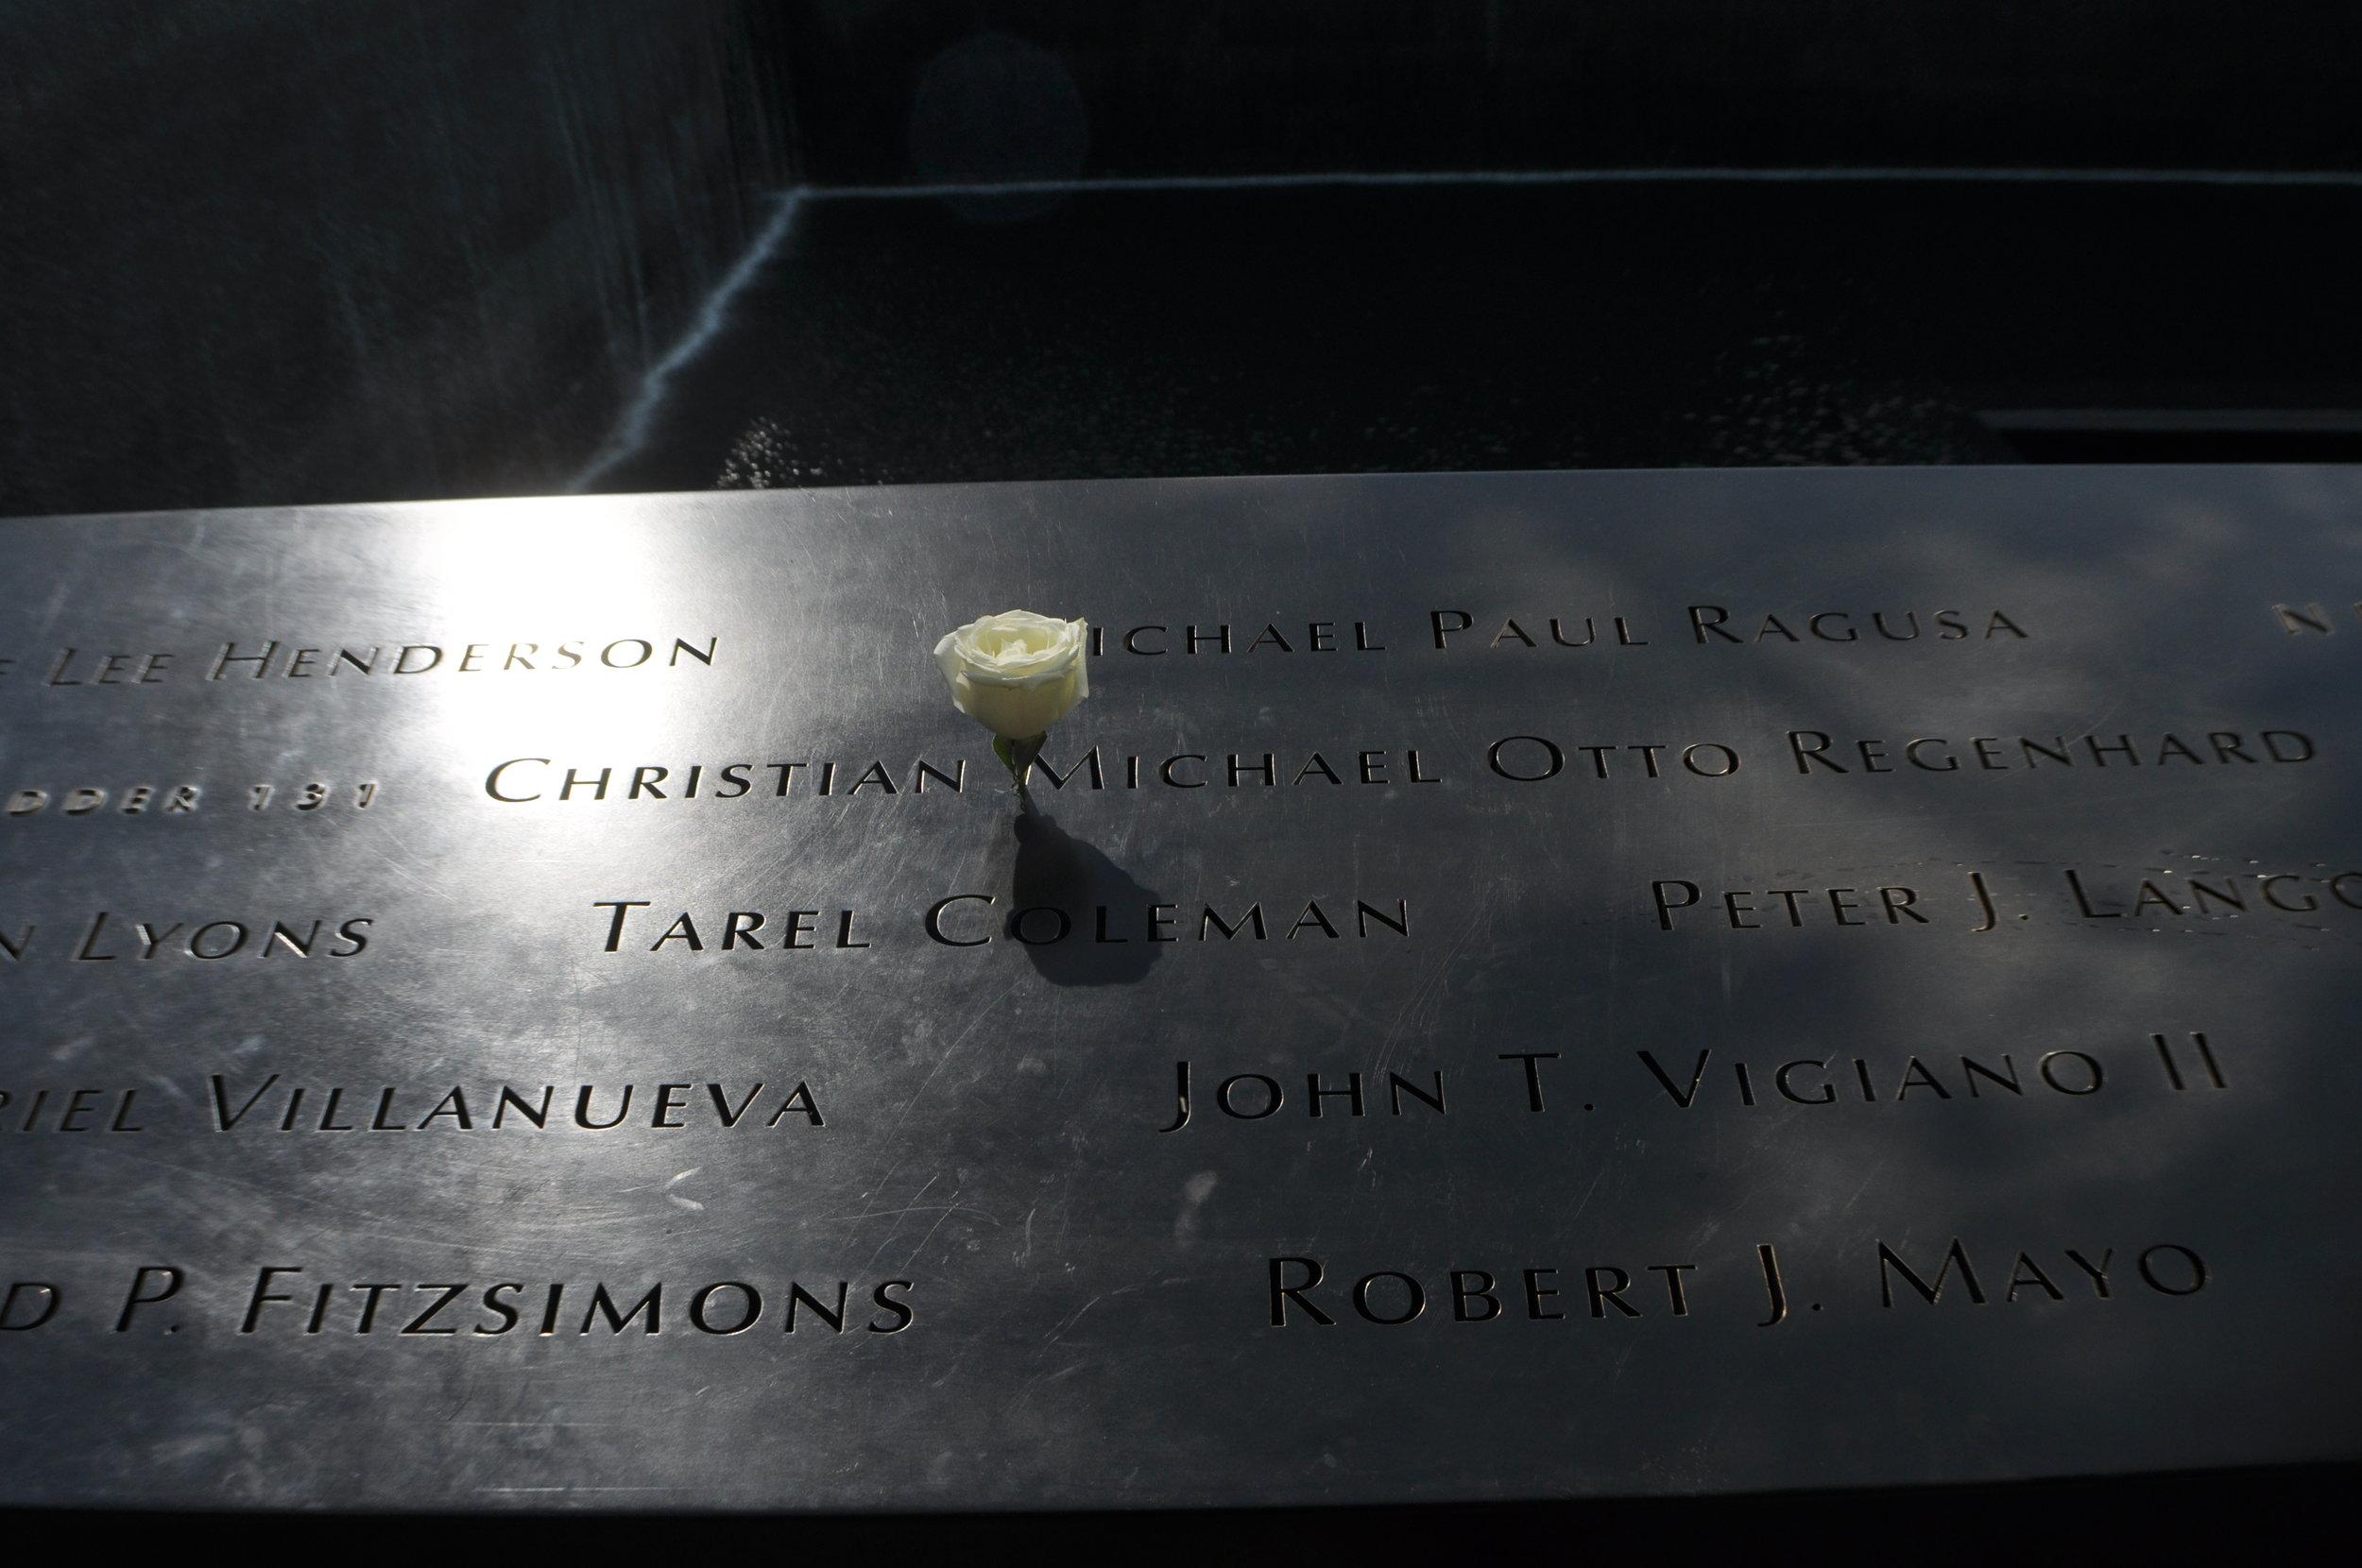 In memory of Christian Michael